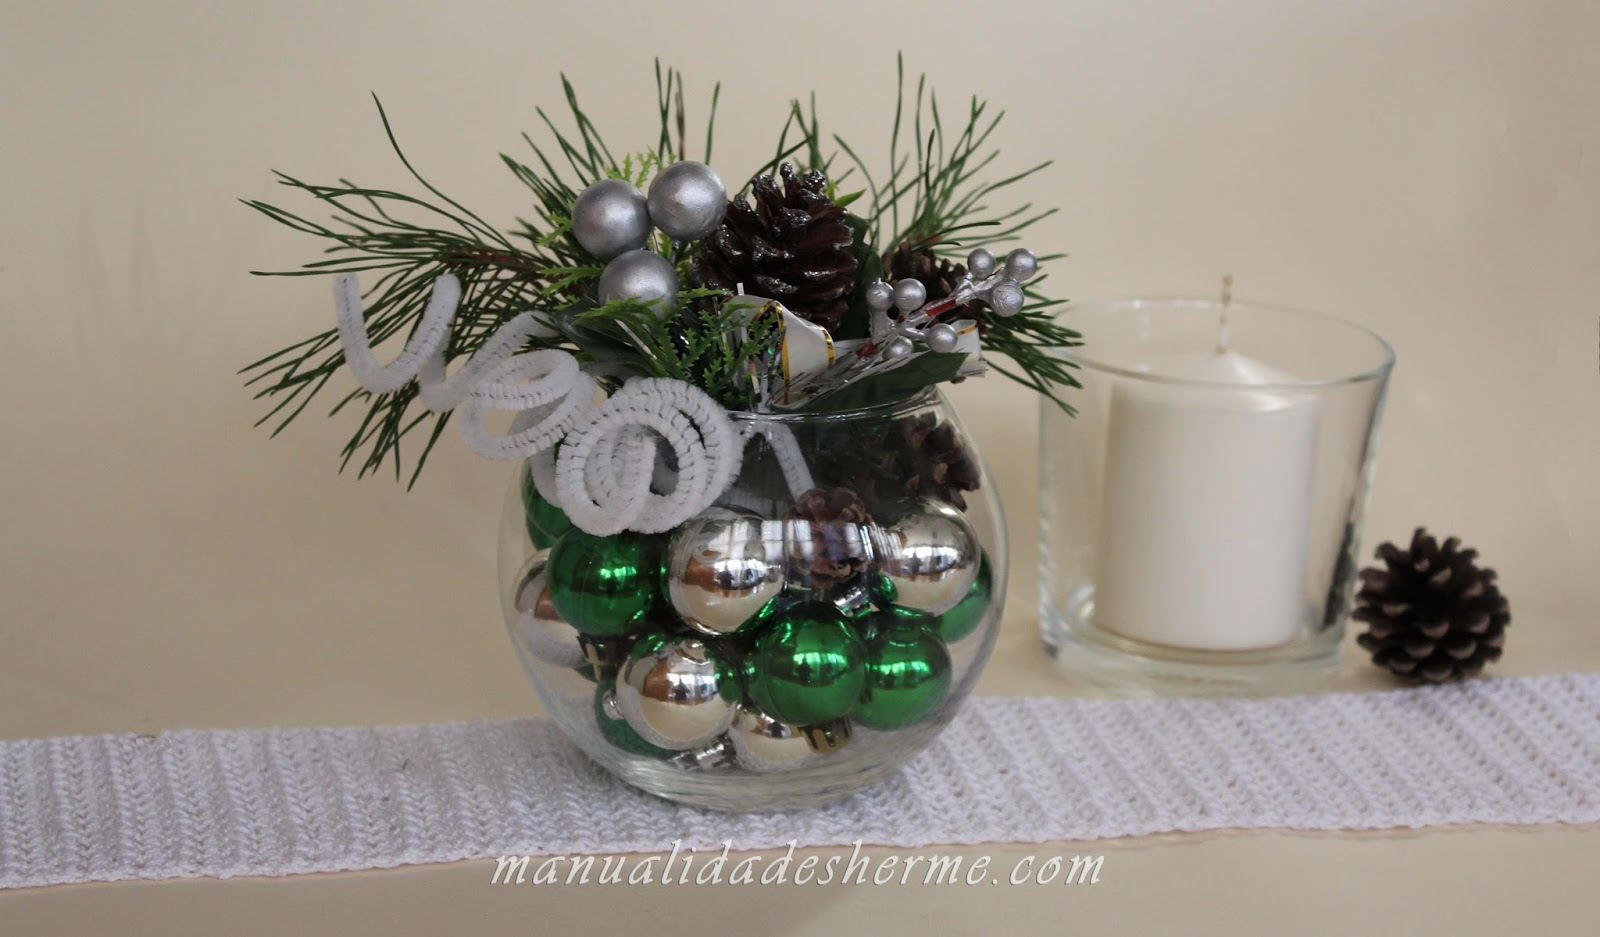 Manualidades herme como hacer un centro de mesa navide o for Como hacer arreglos de navidad